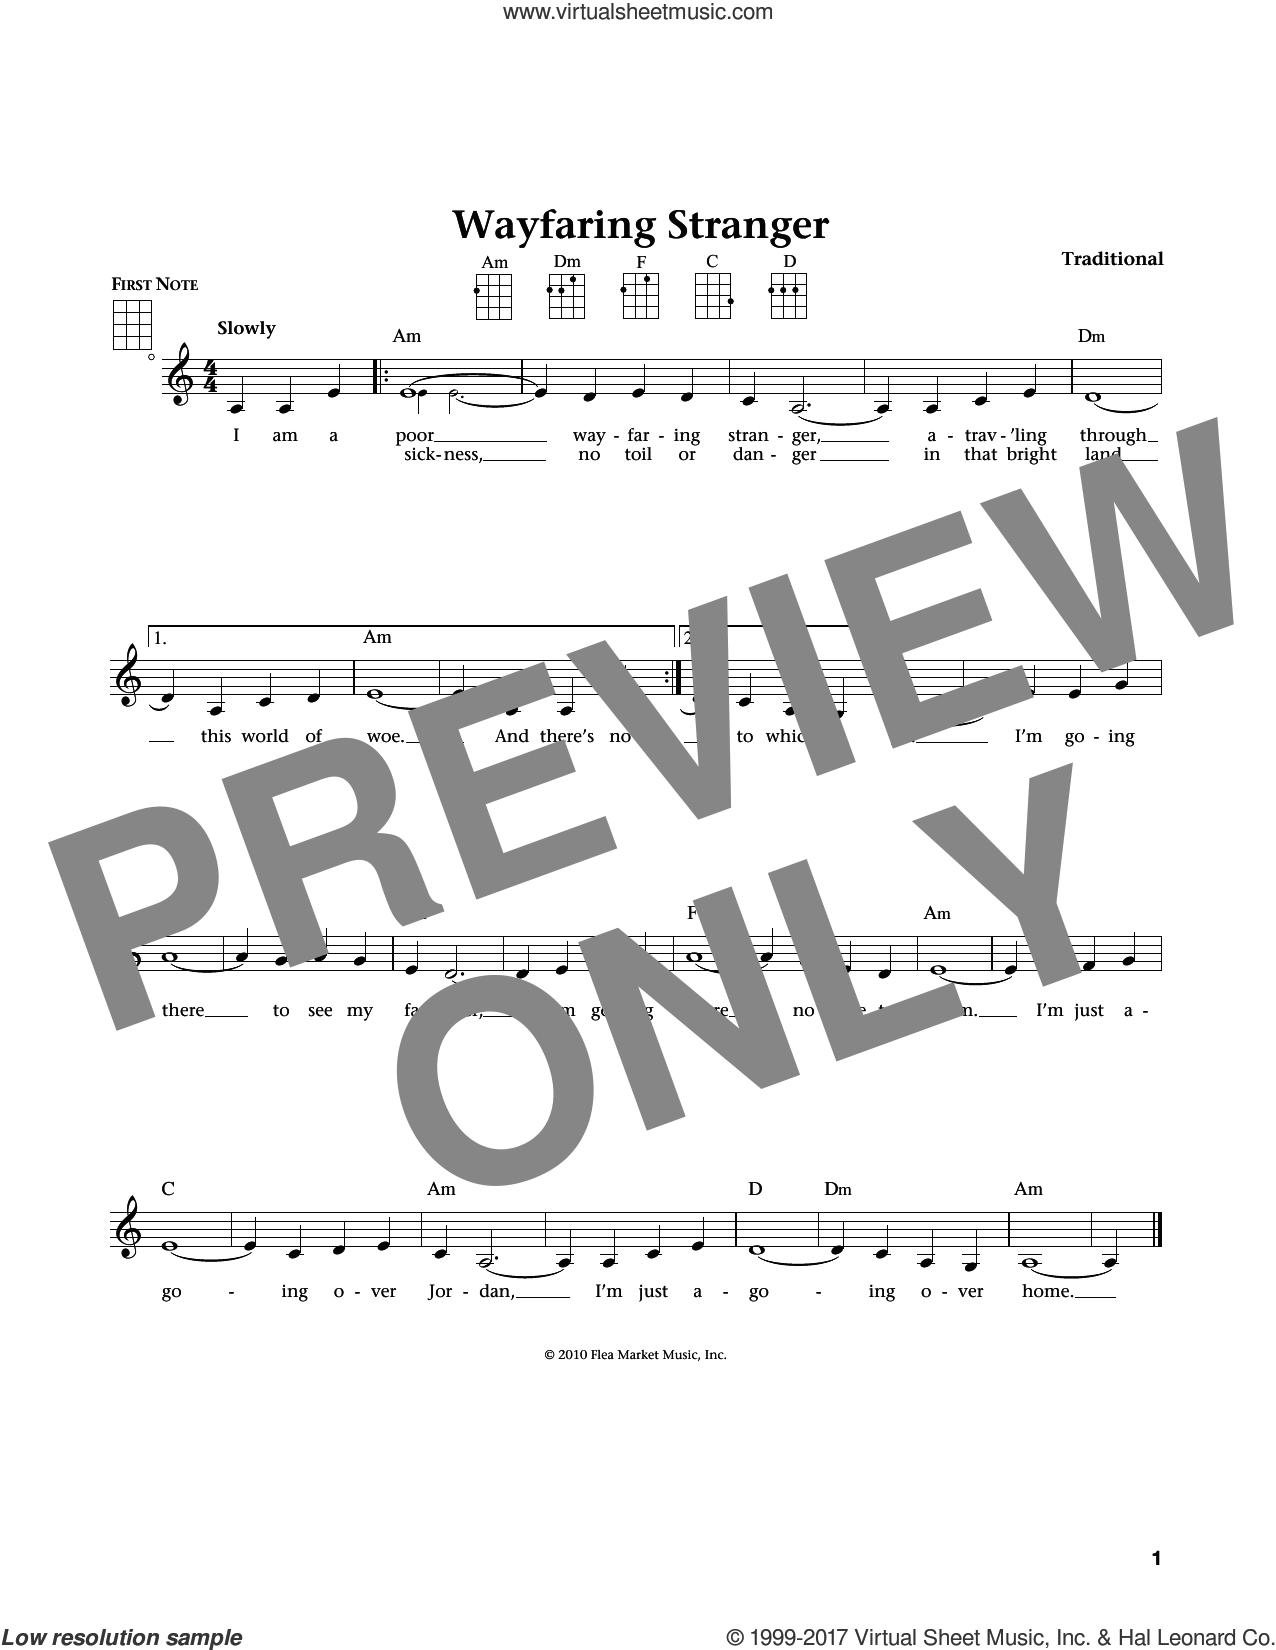 Wayfaring Stranger (from The Daily Ukulele) (arr. Liz and Jim Beloff) sheet music for ukulele , Jim Beloff and Liz Beloff, intermediate skill level